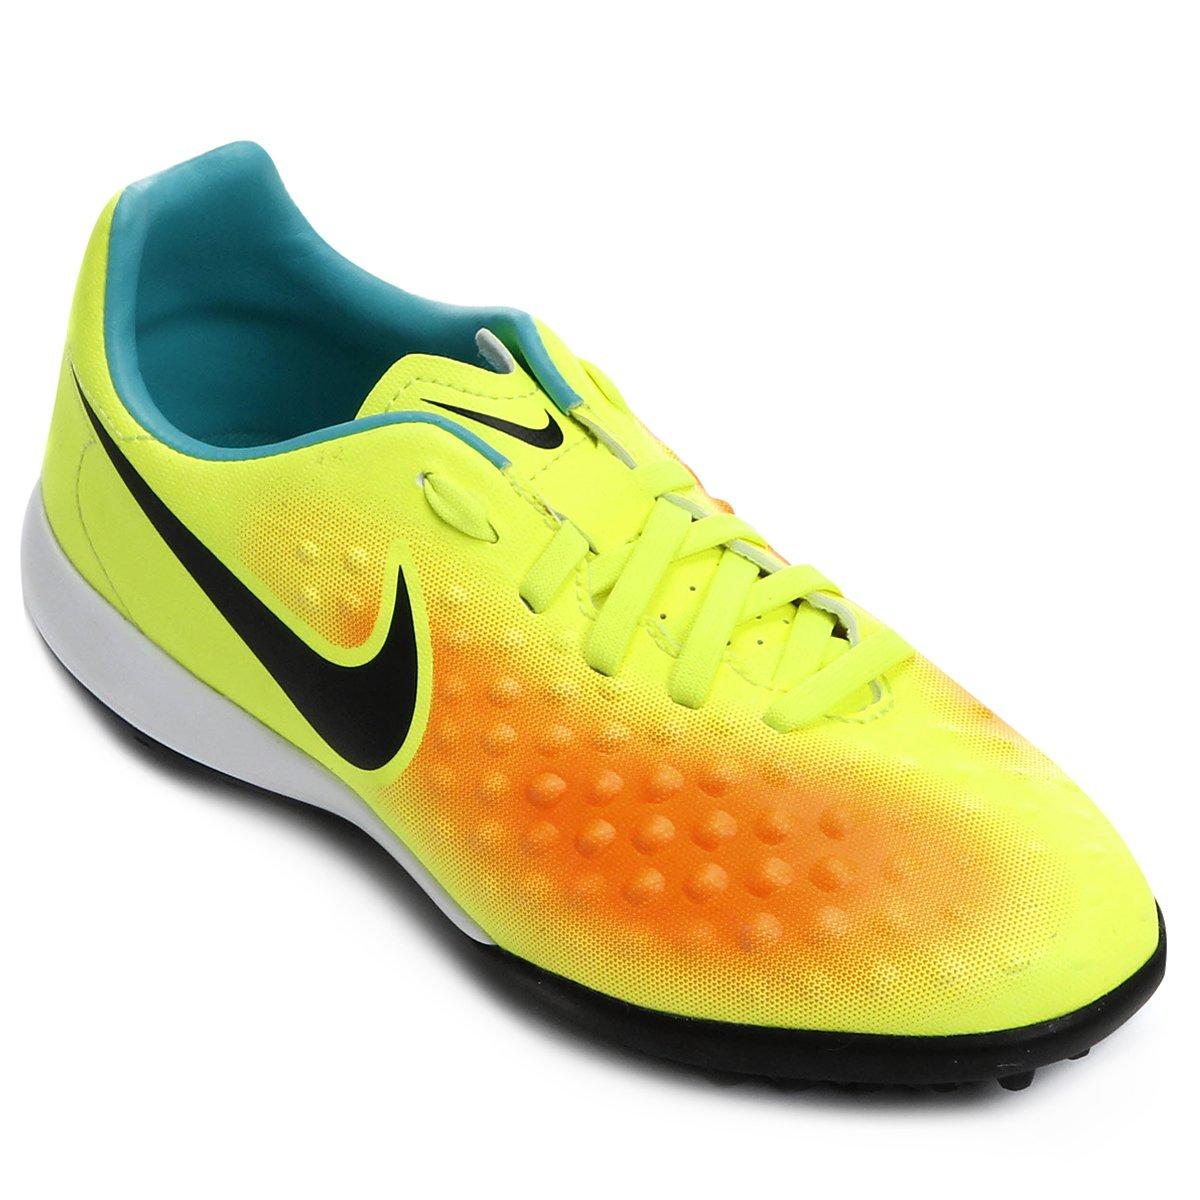 8823240ea2 Chuteira Society Infantil Nike Magista Opus II TF - Compre Agora ...